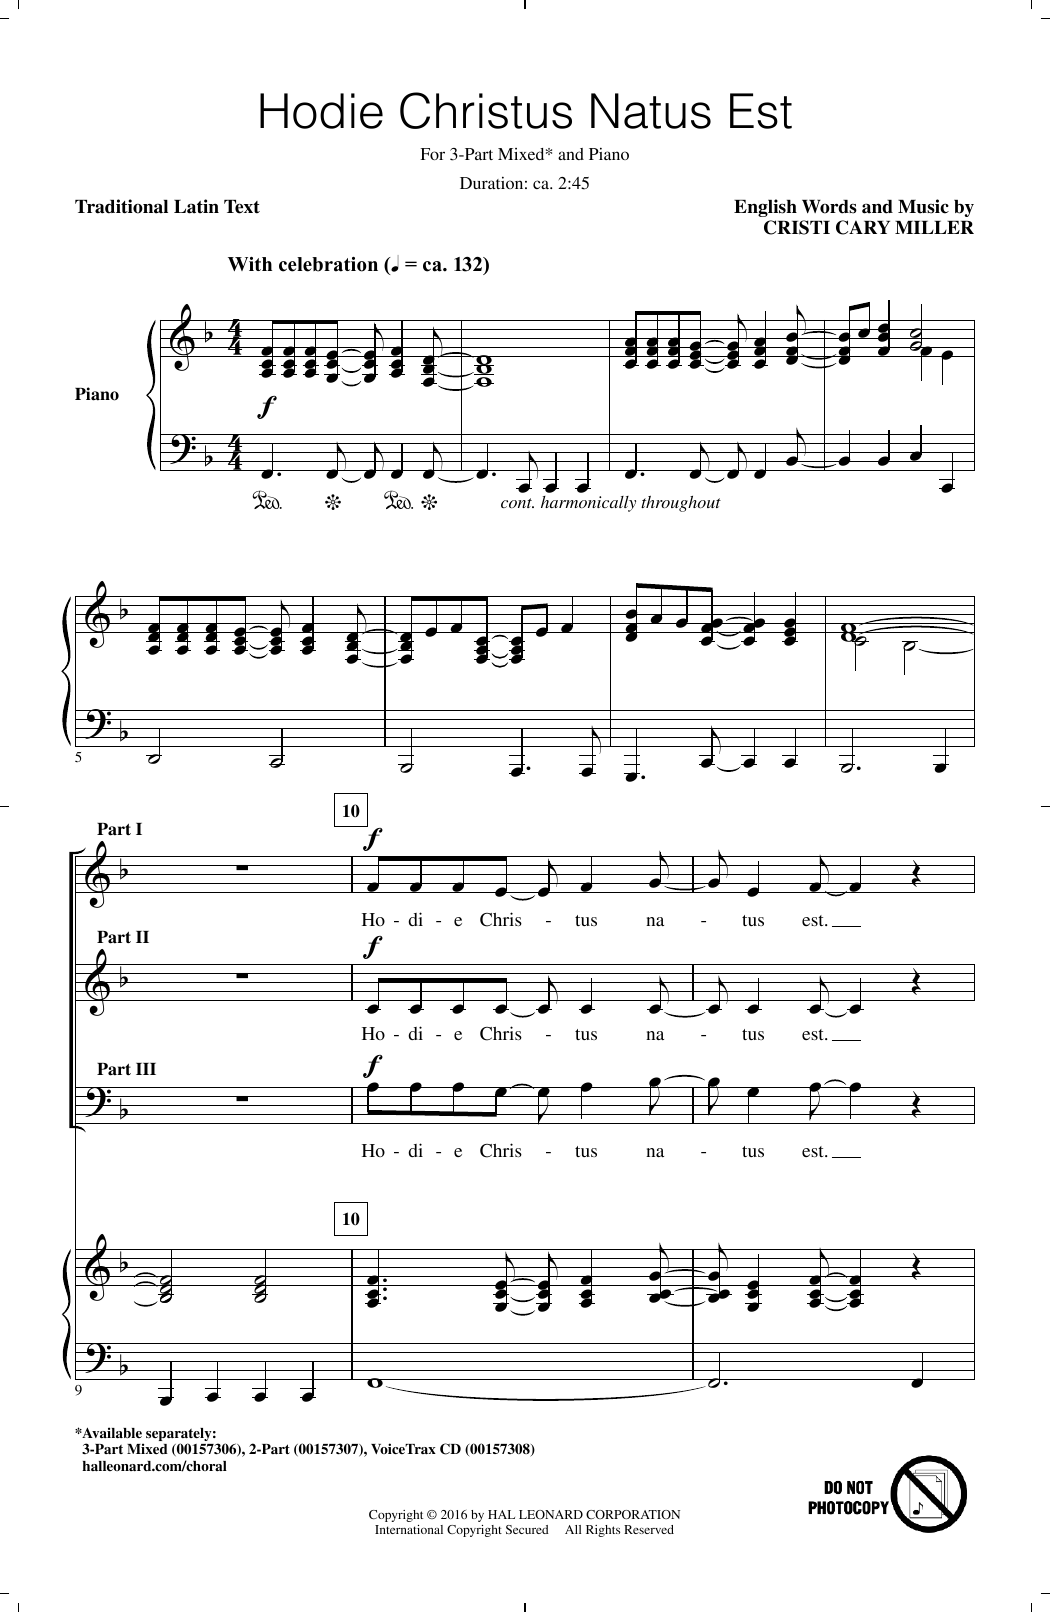 Cristi Cary Miller Hodie Christus Natus Est sheet music notes and chords. Download Printable PDF.